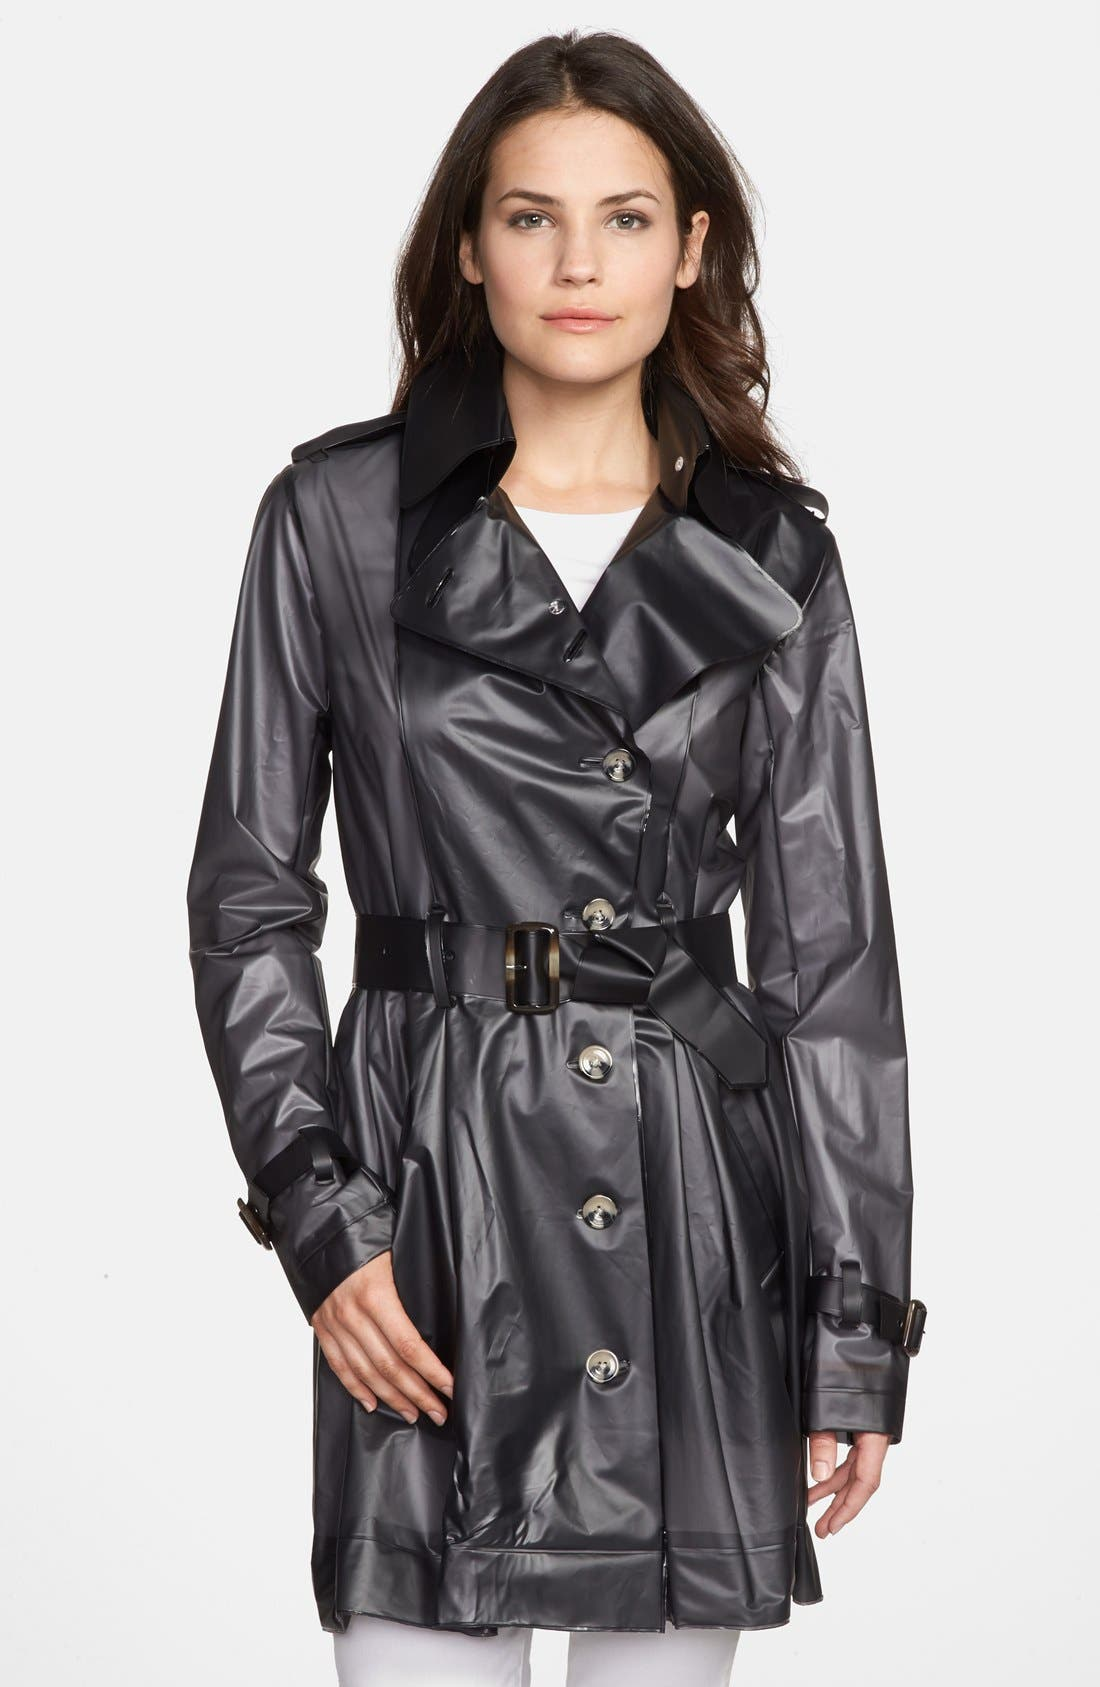 TERRA NEW YORK Waterproof Translucent Trench Coat, Main, color, 001